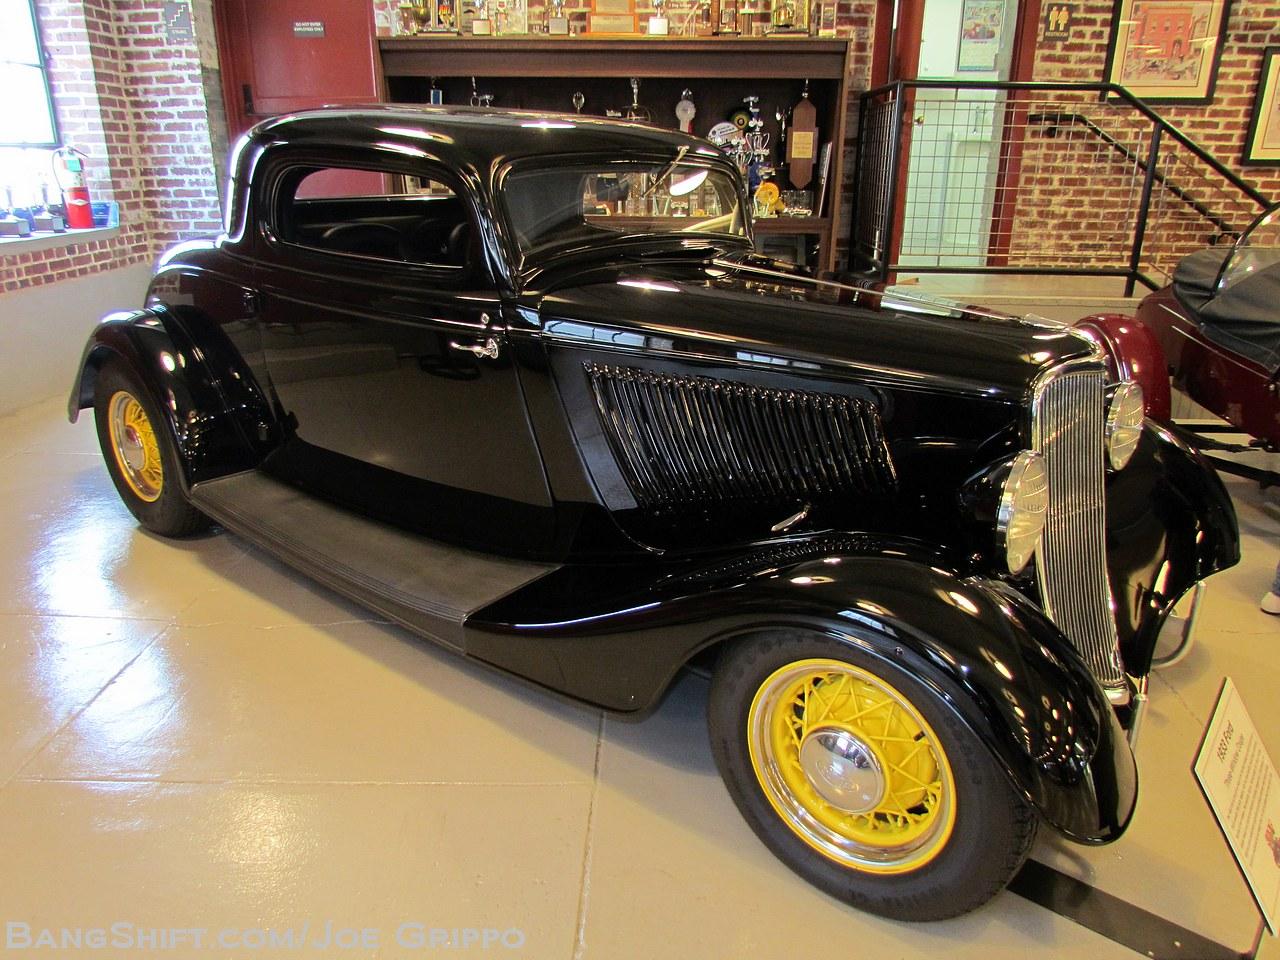 Project Cars Hot Rod Garage : Bangshift dog garage open house epic ford hot